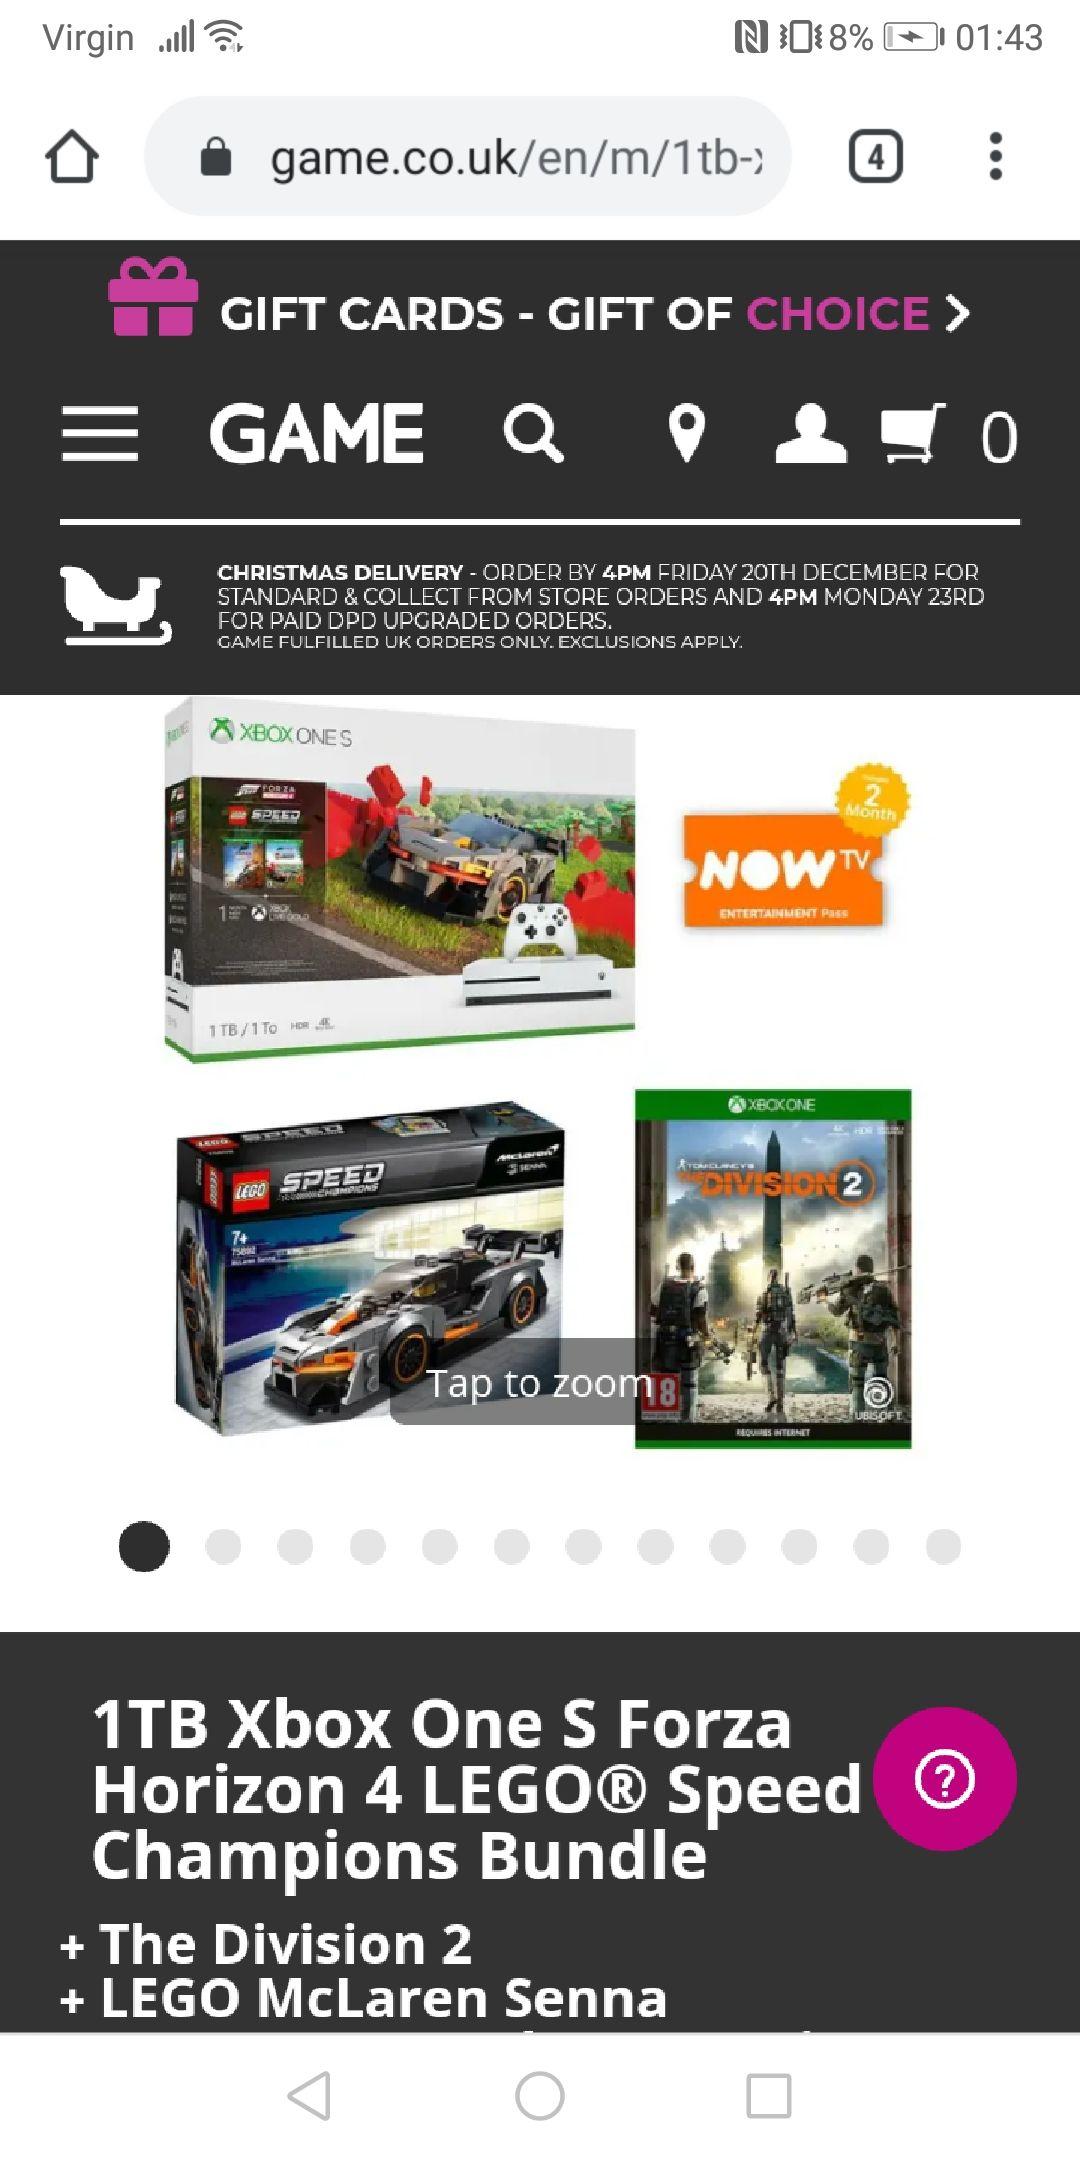 1TB Xbox One S Forza Horizon 4 LEGO® Speed Champions Bundle